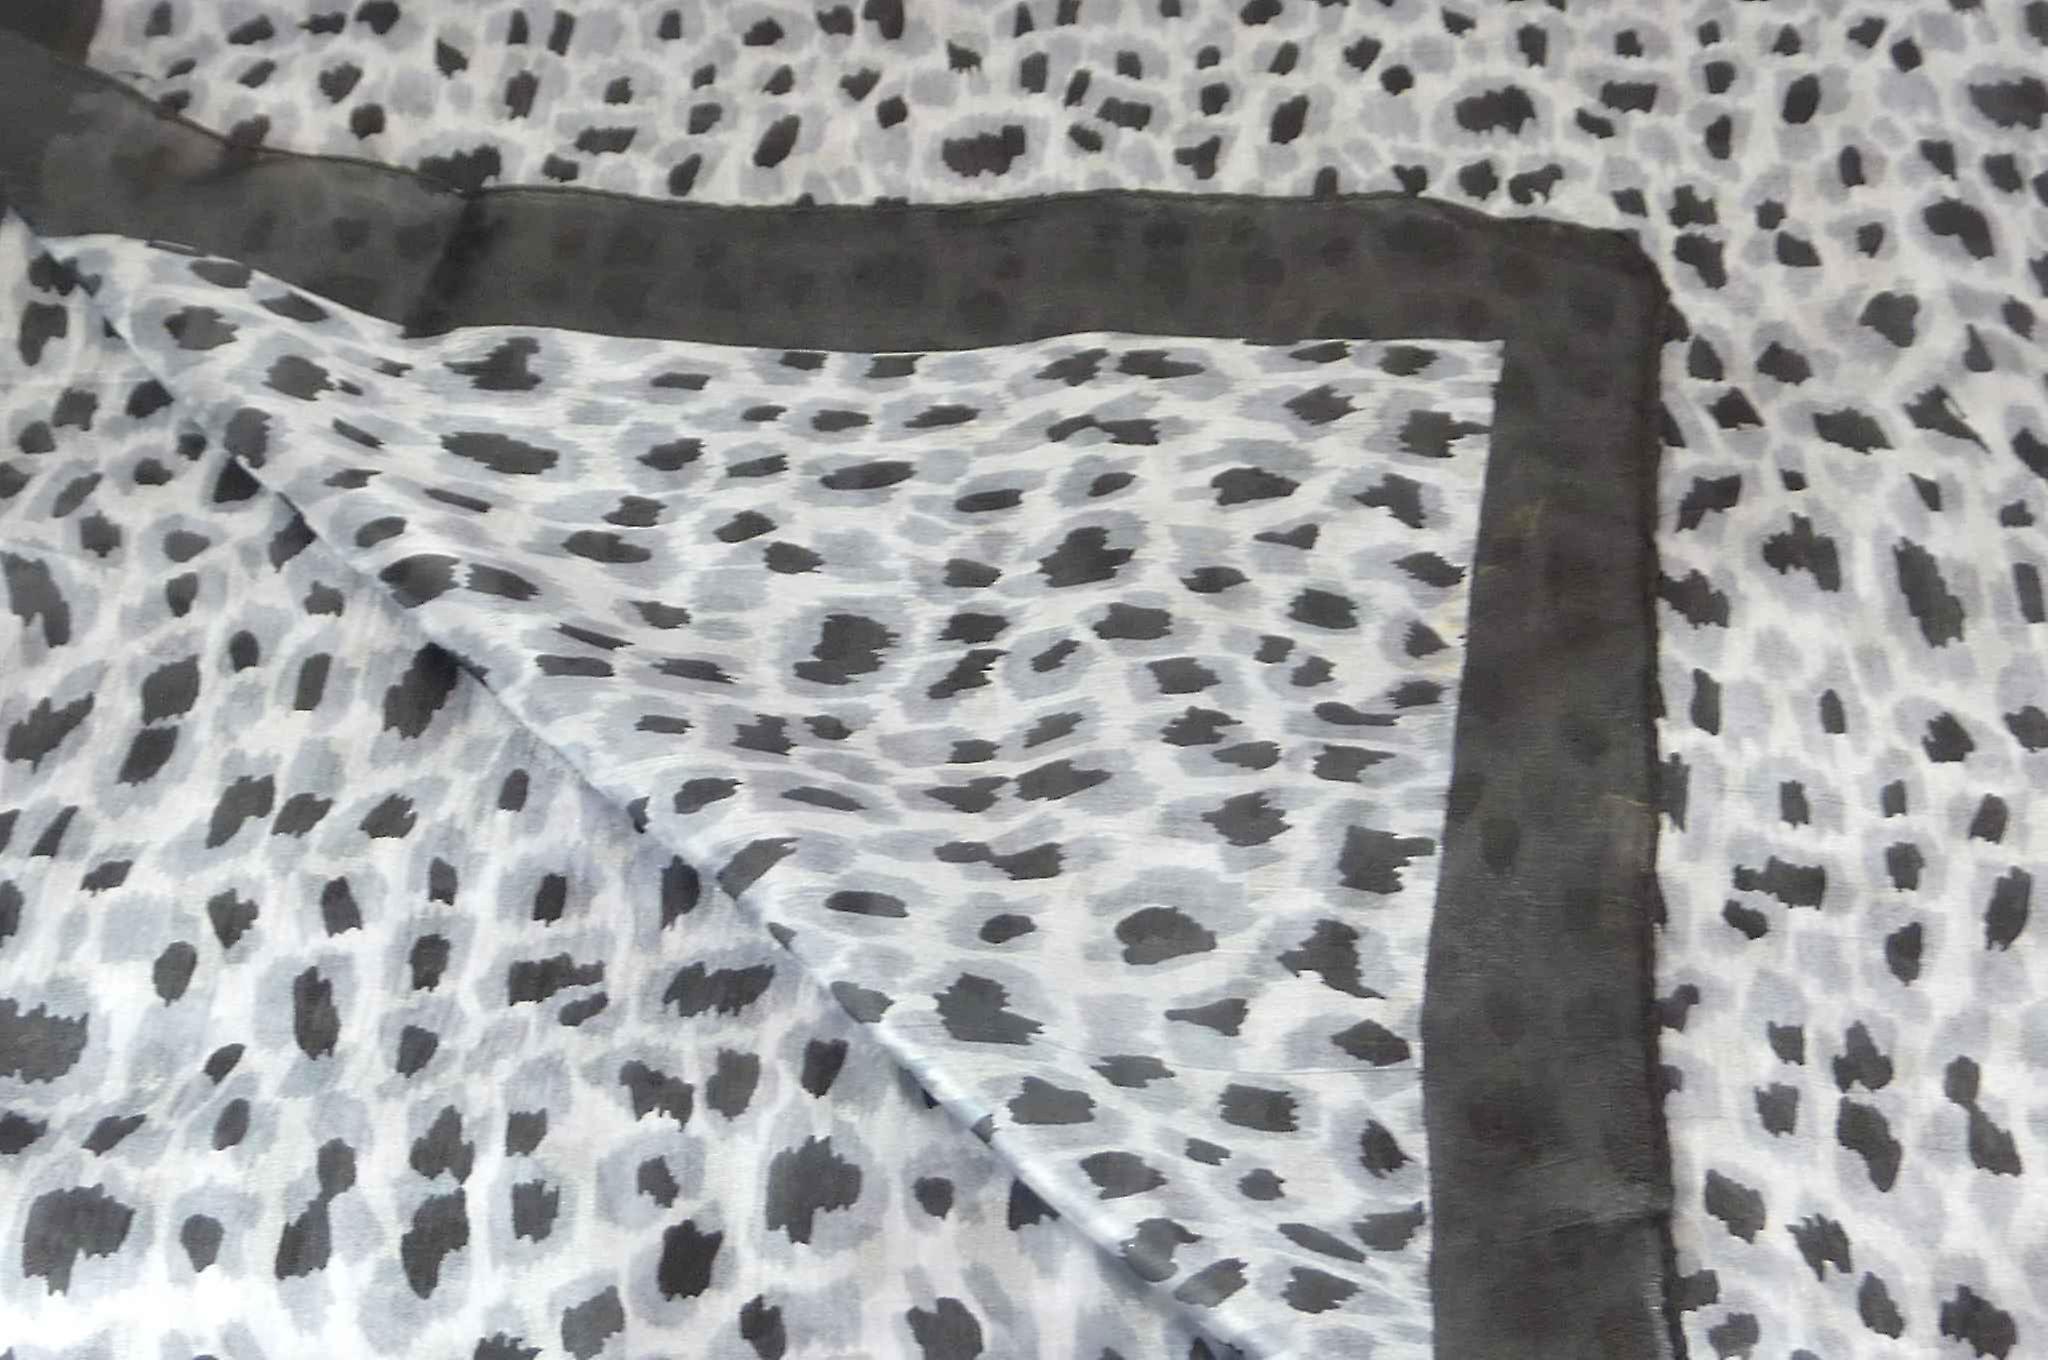 Mulberry Silk Contemporary Square Scarf Vihar Black by Pashmina & Silk